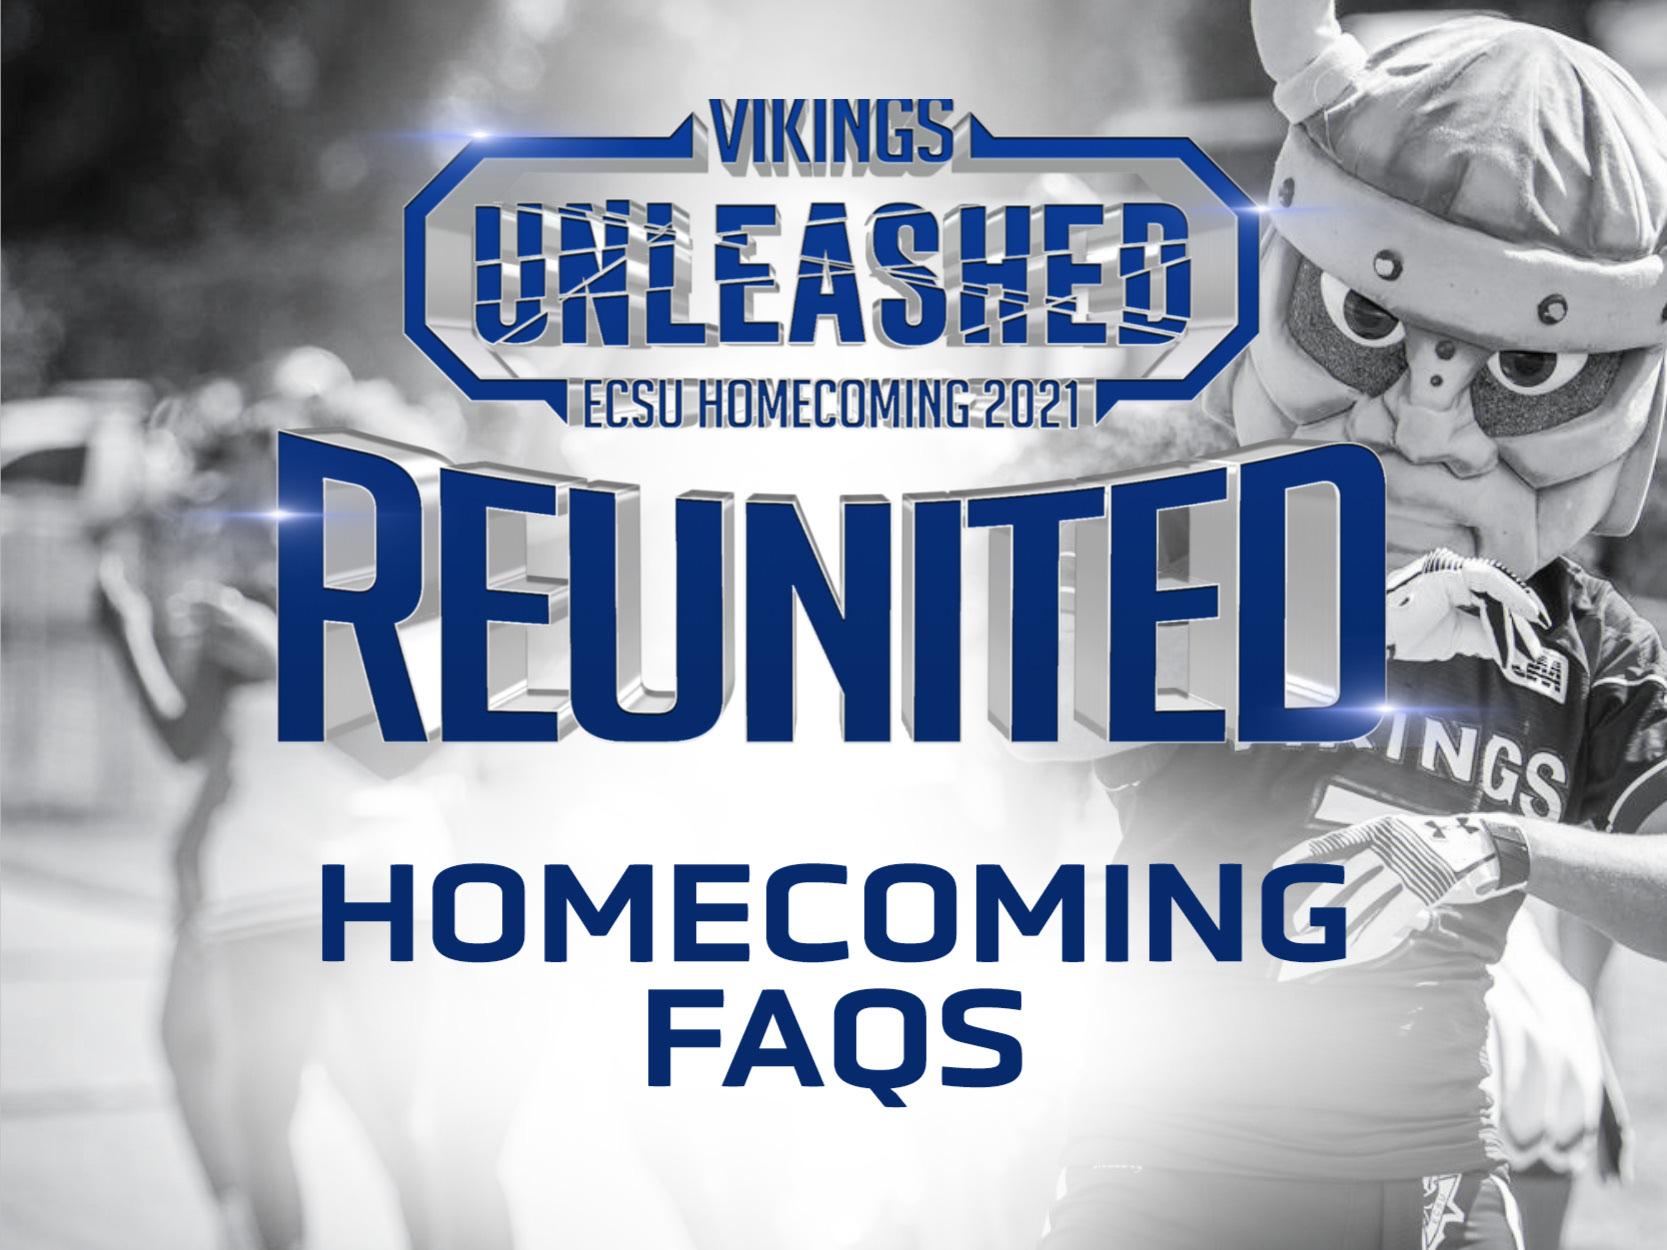 Homecoming FAQ